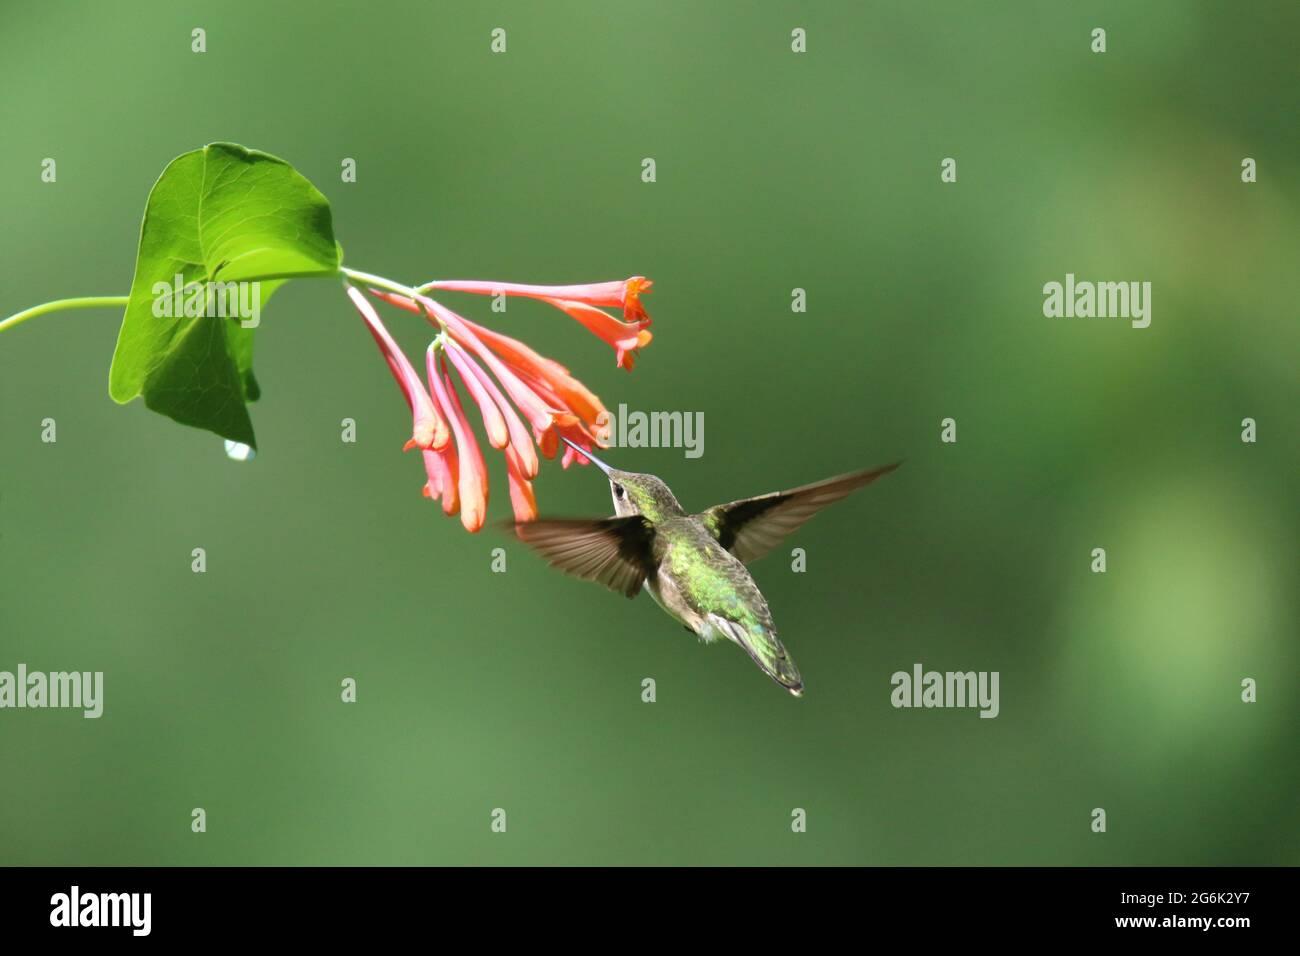 Female ruby throated hummingbird visiting honeysuckle flowers to feed on nectar Stock Photo